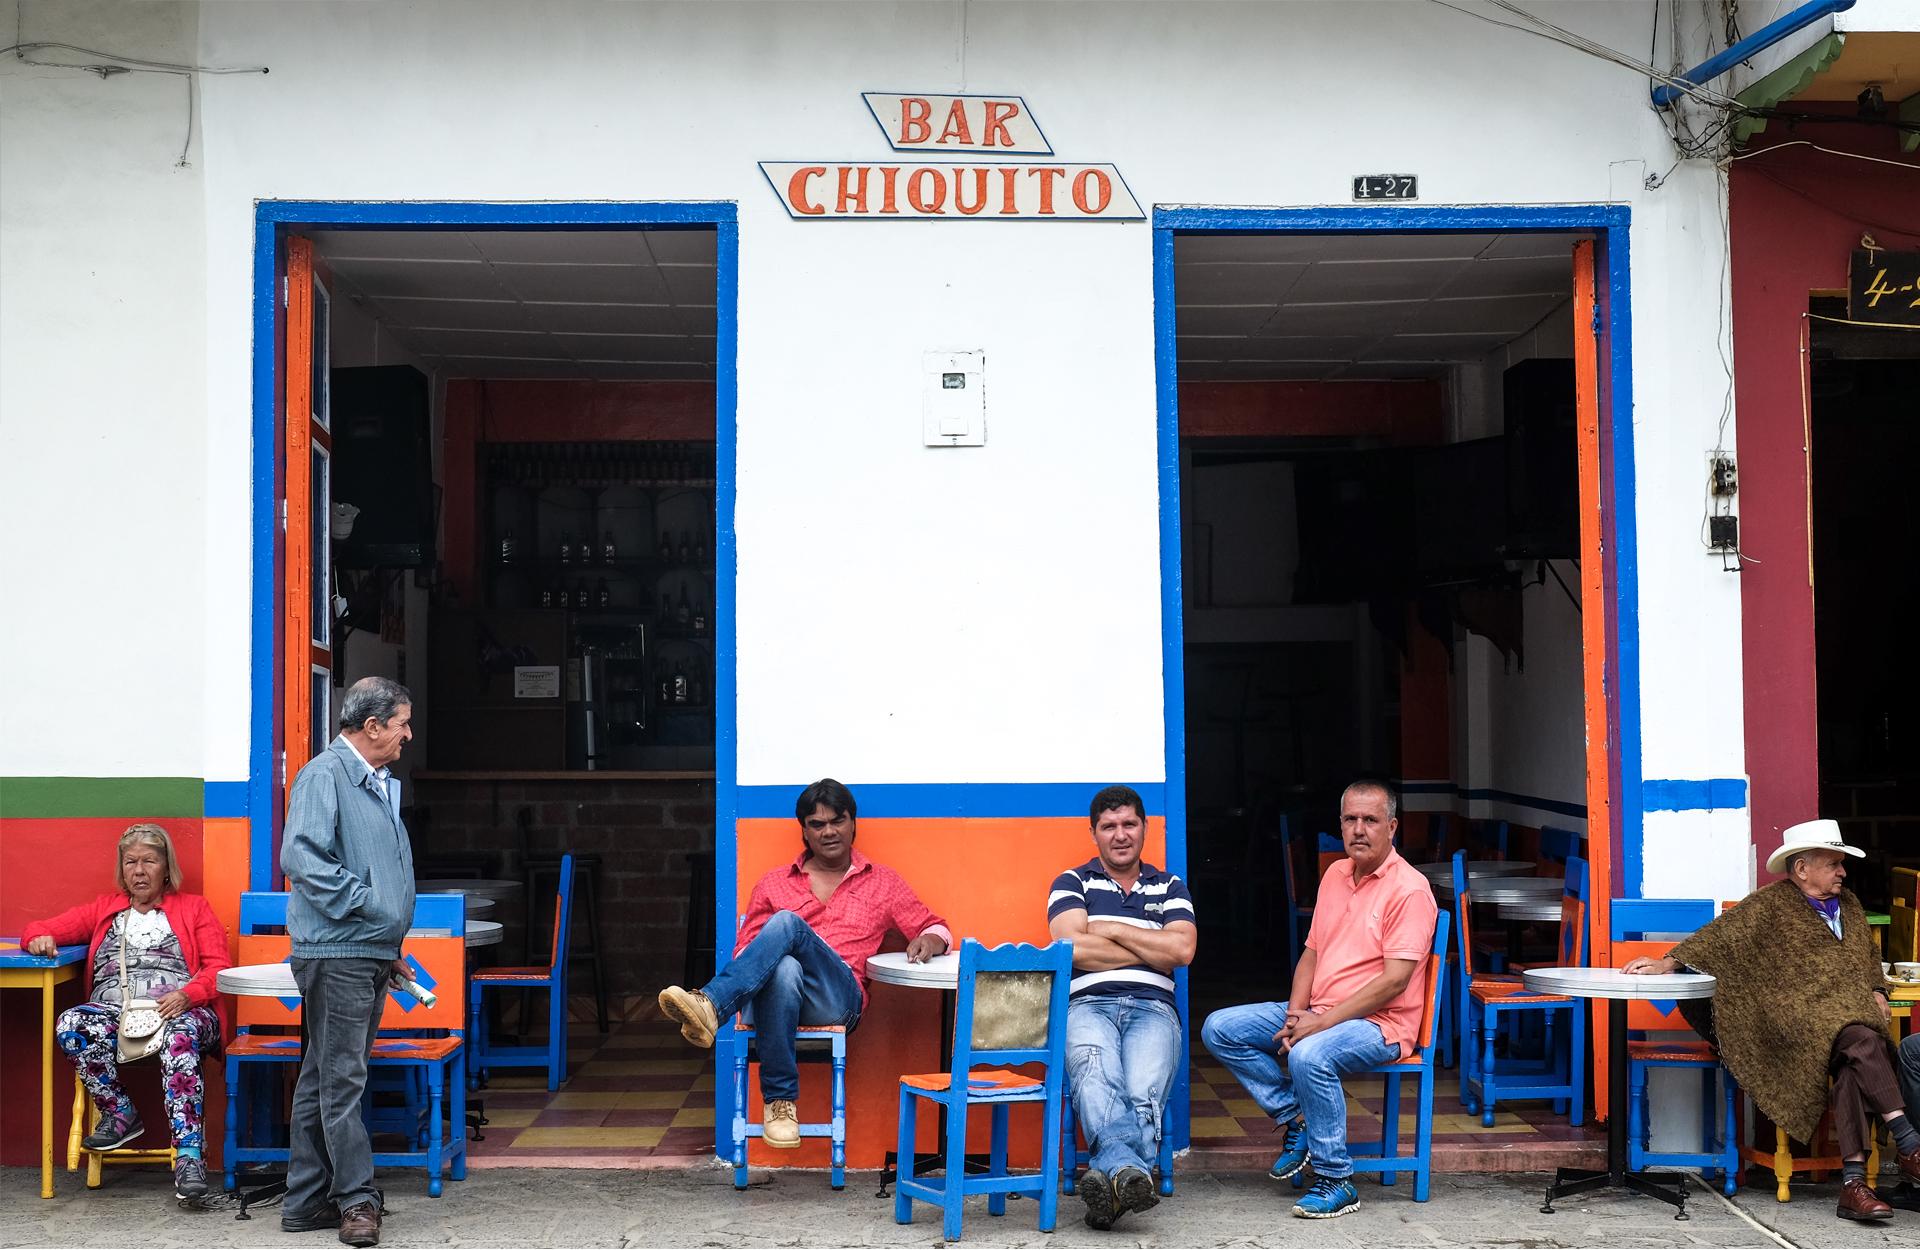 bar Chiquita color blue men